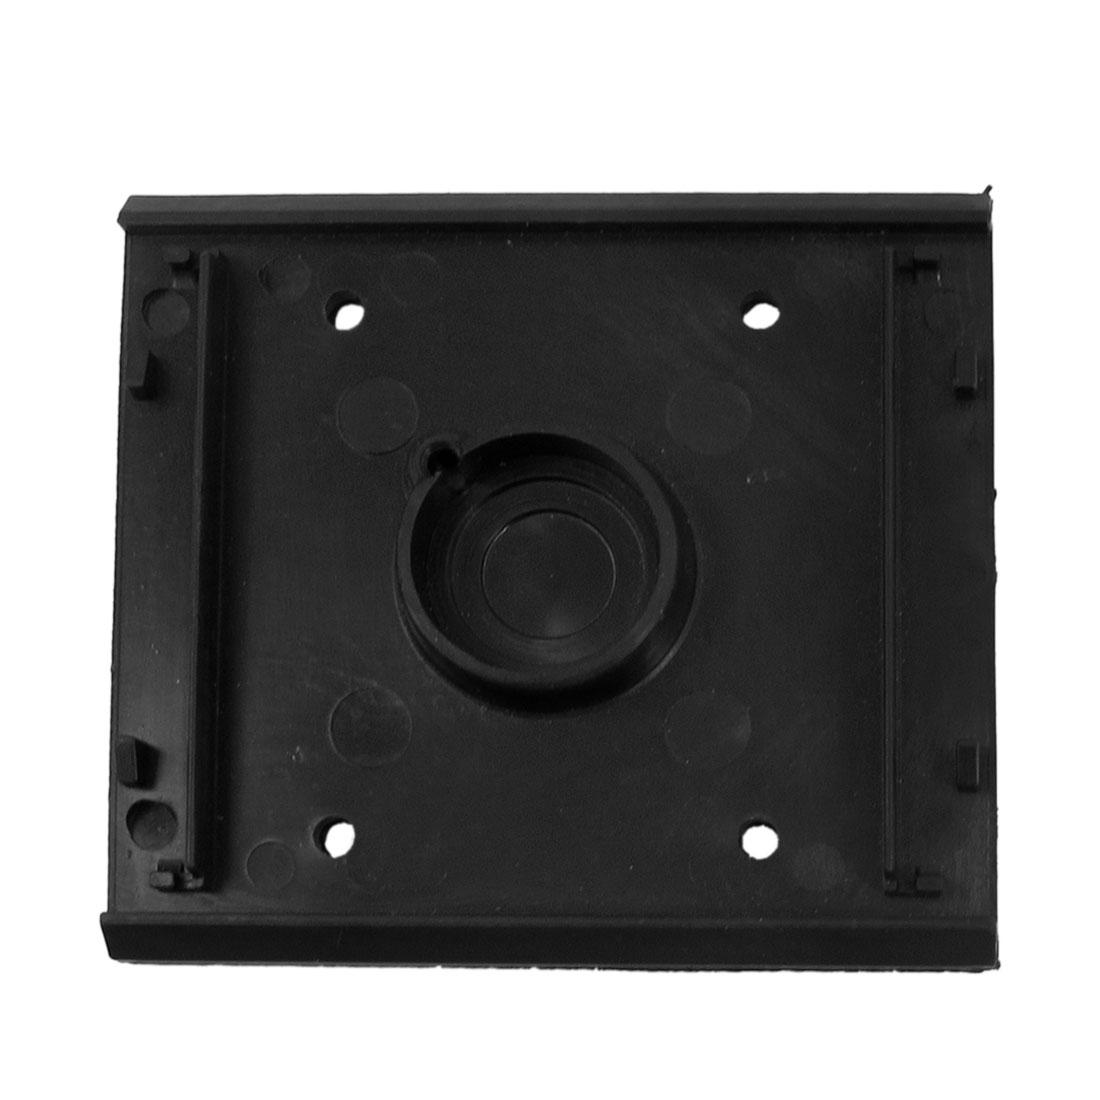 Black Plastic Component Base for Makita 4510 Electric Sander